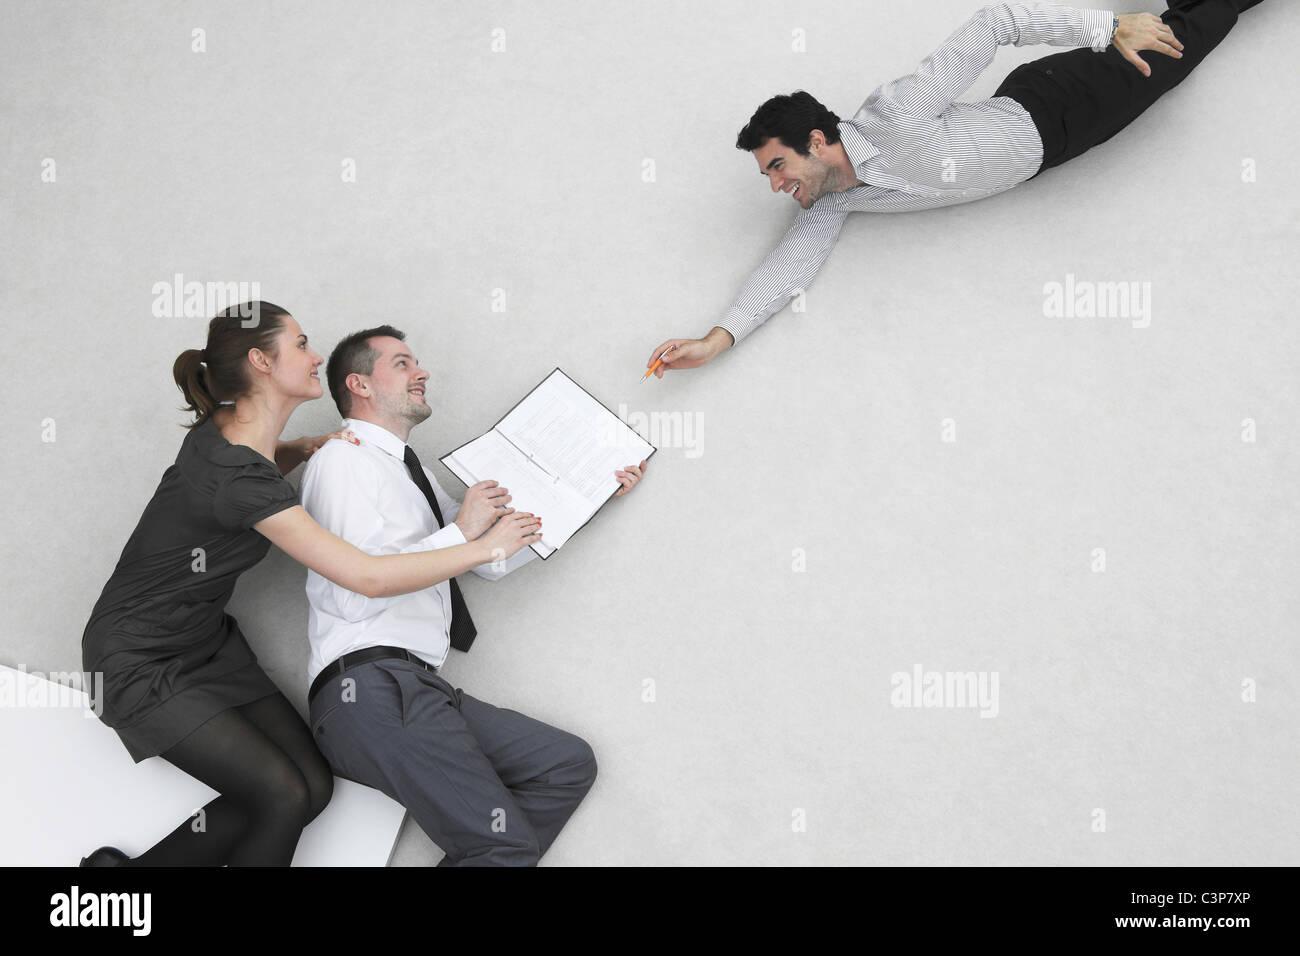 Drei Geschäftsleute, Unternehmer, Vertragsabschluss, erhöht, Ansicht Stockbild